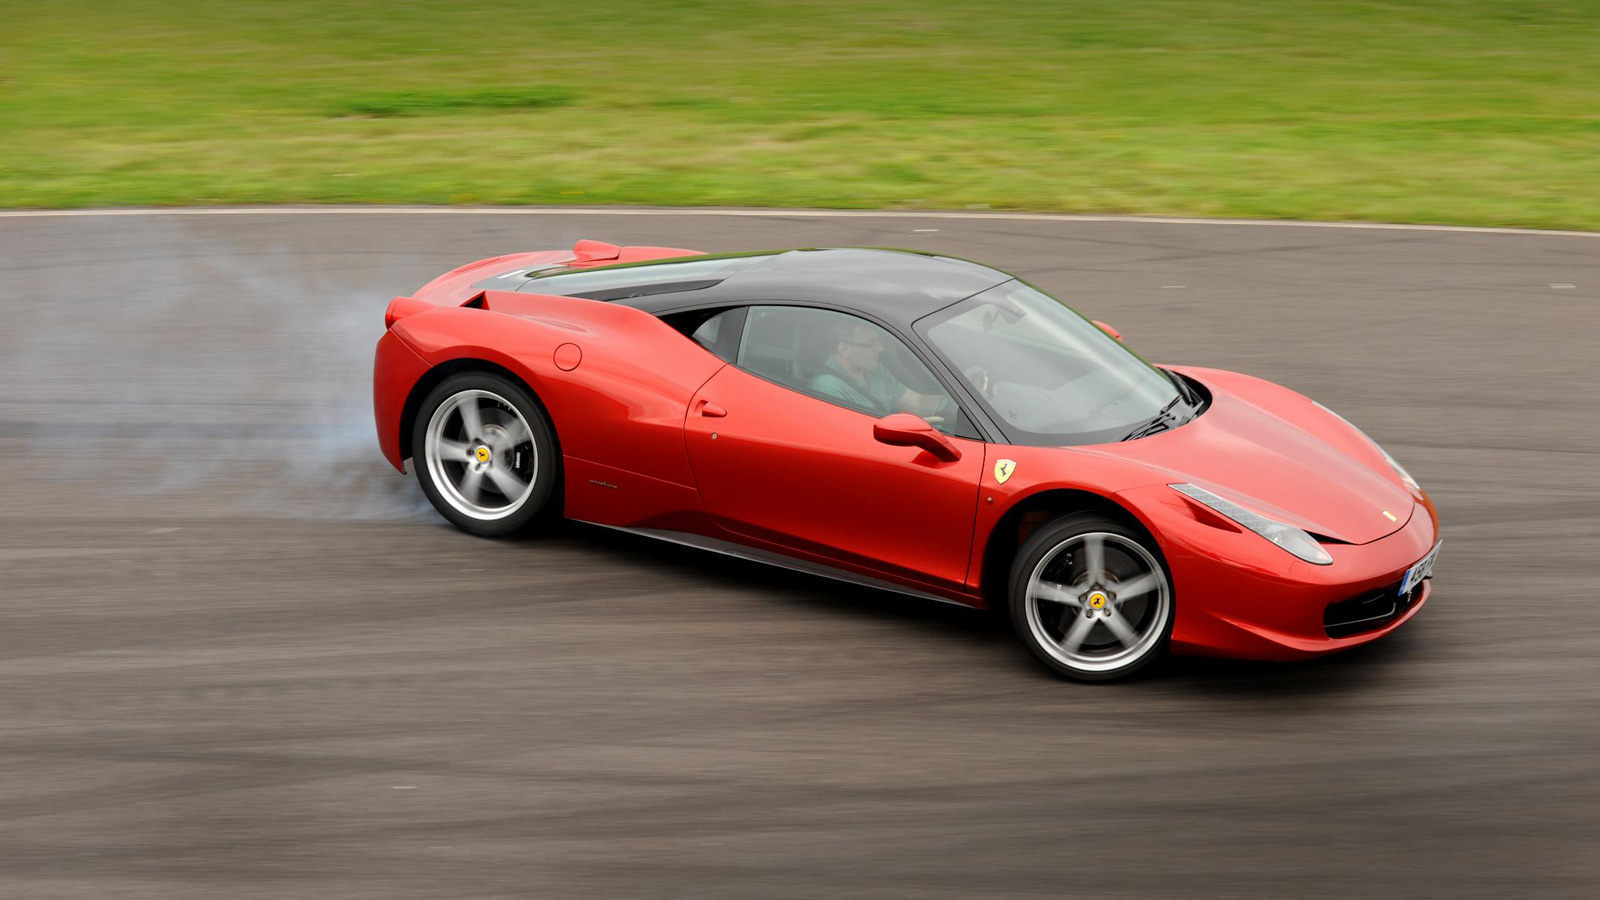 Ferrari 458 Italia Wallpaper 1600x900